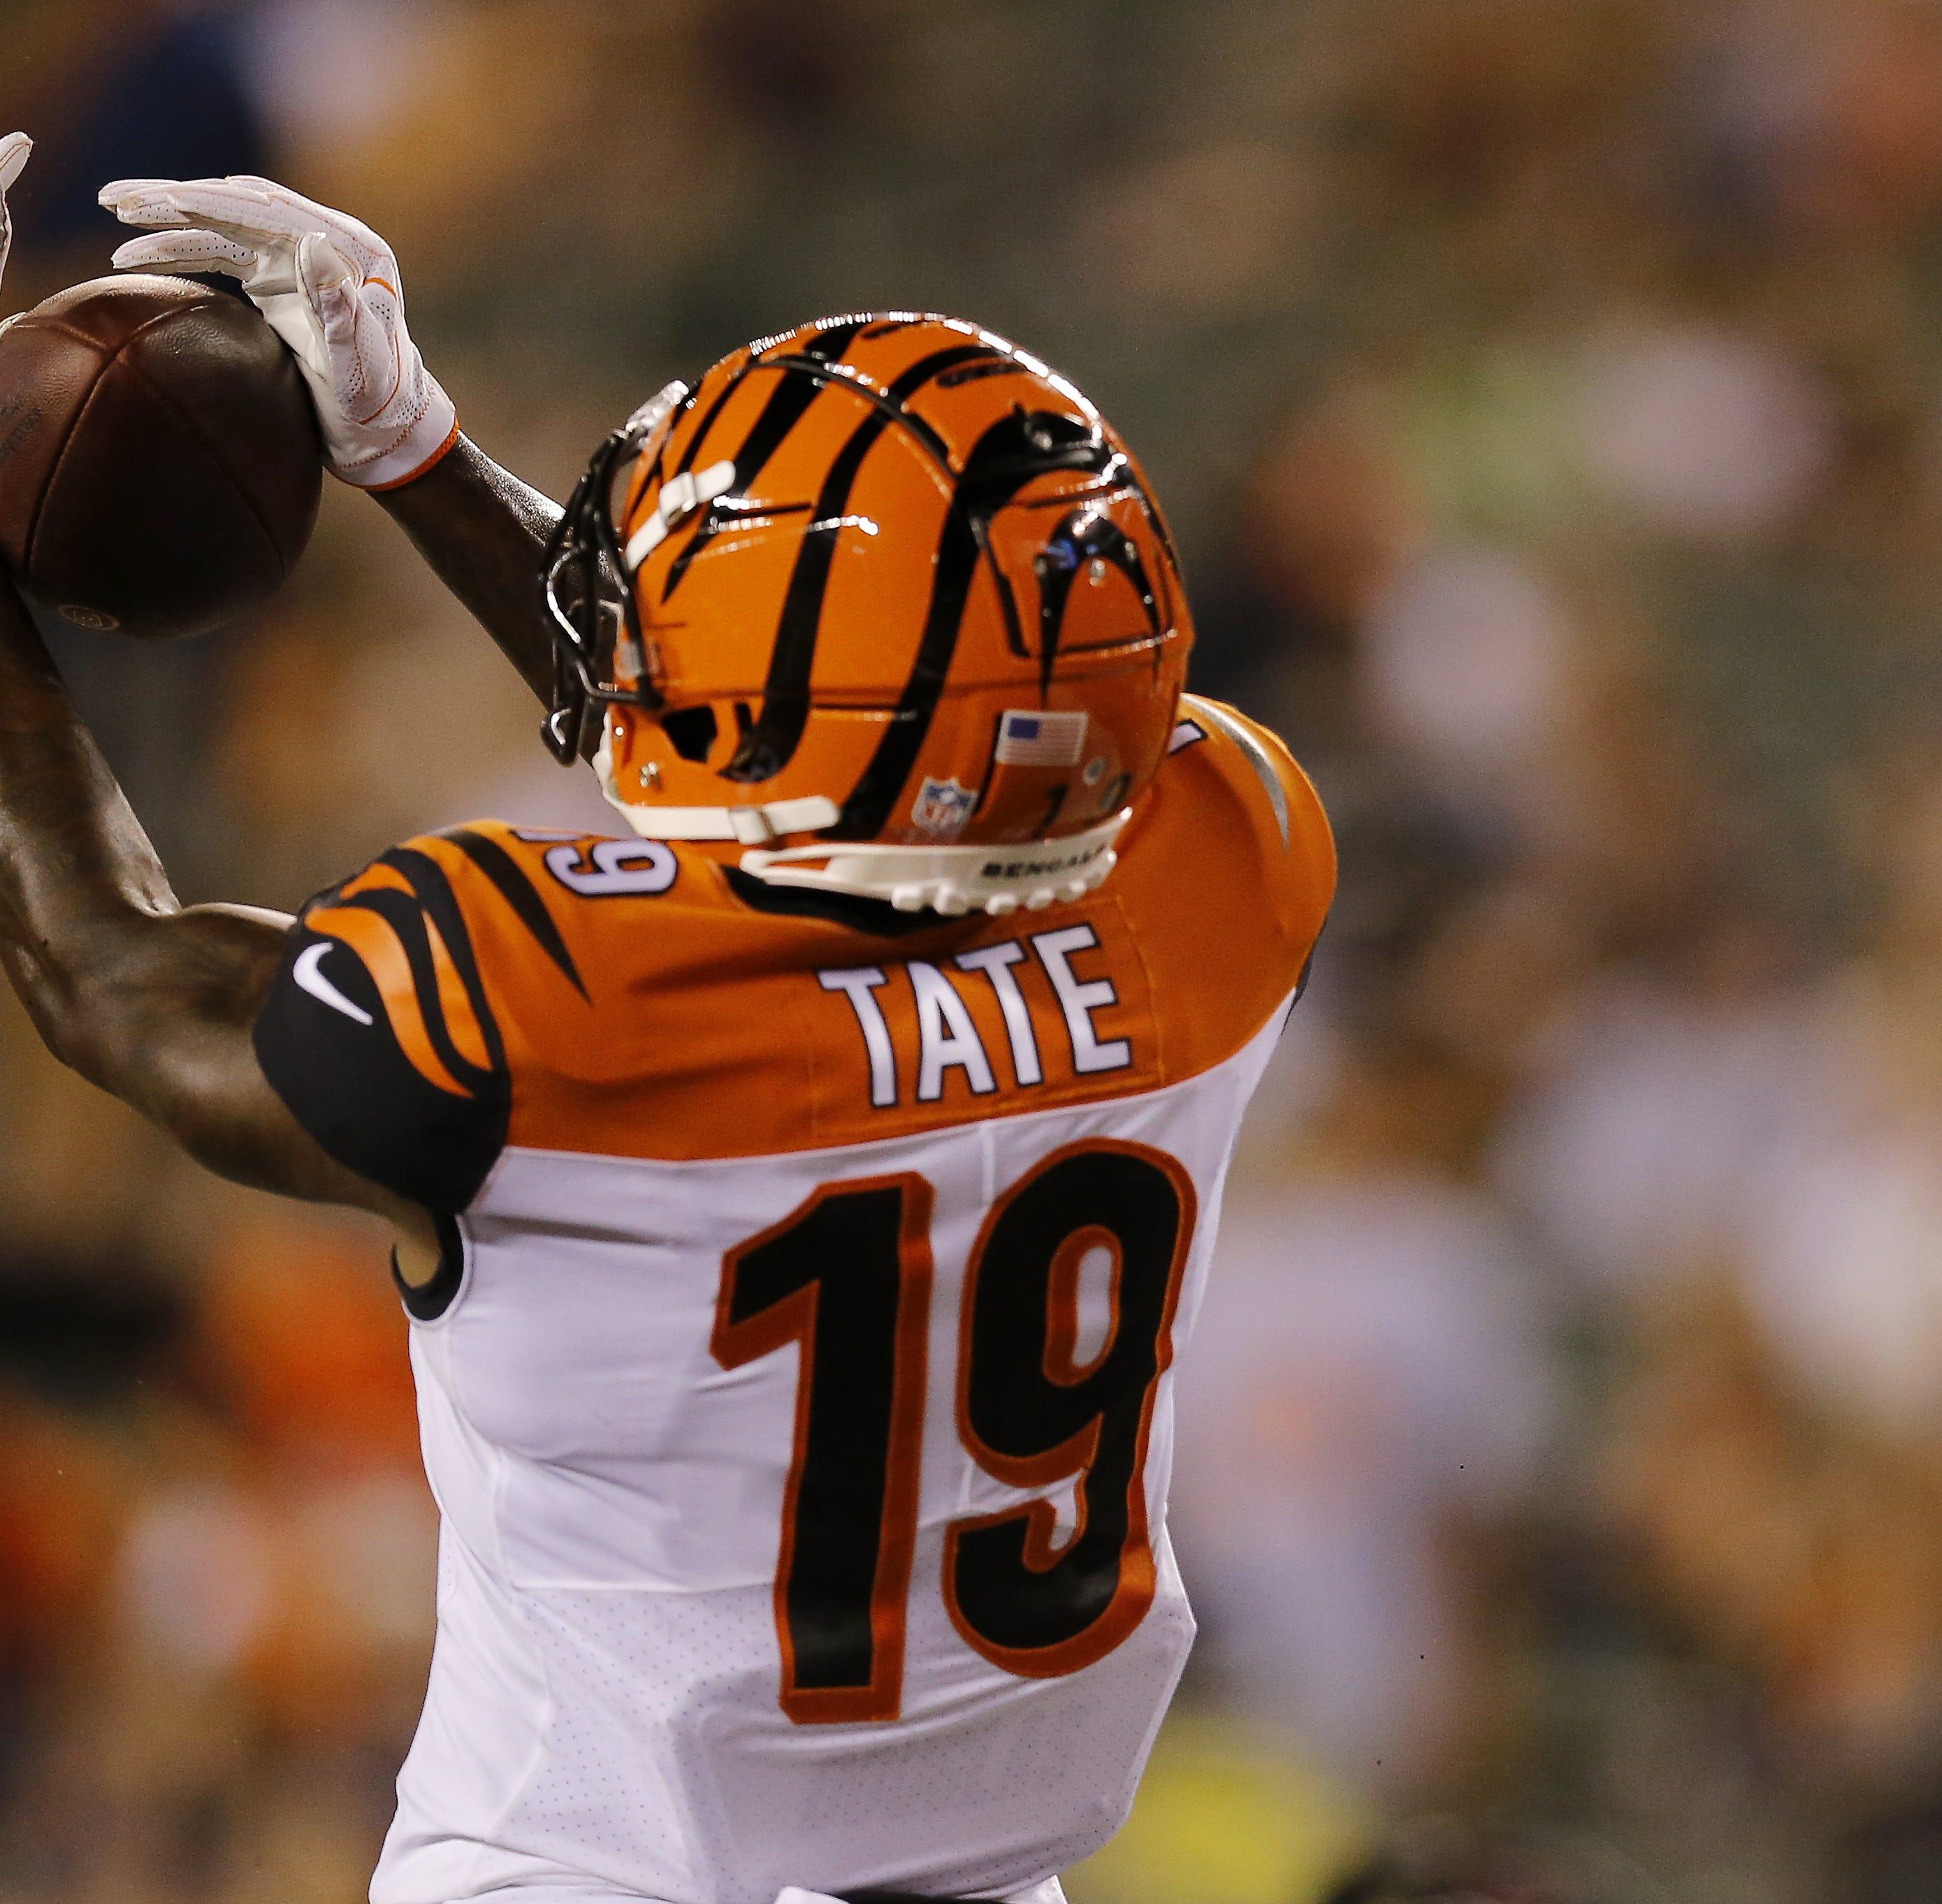 Cincinnati Bengals' rookie WR Auden Tate rising to catch a roster spot